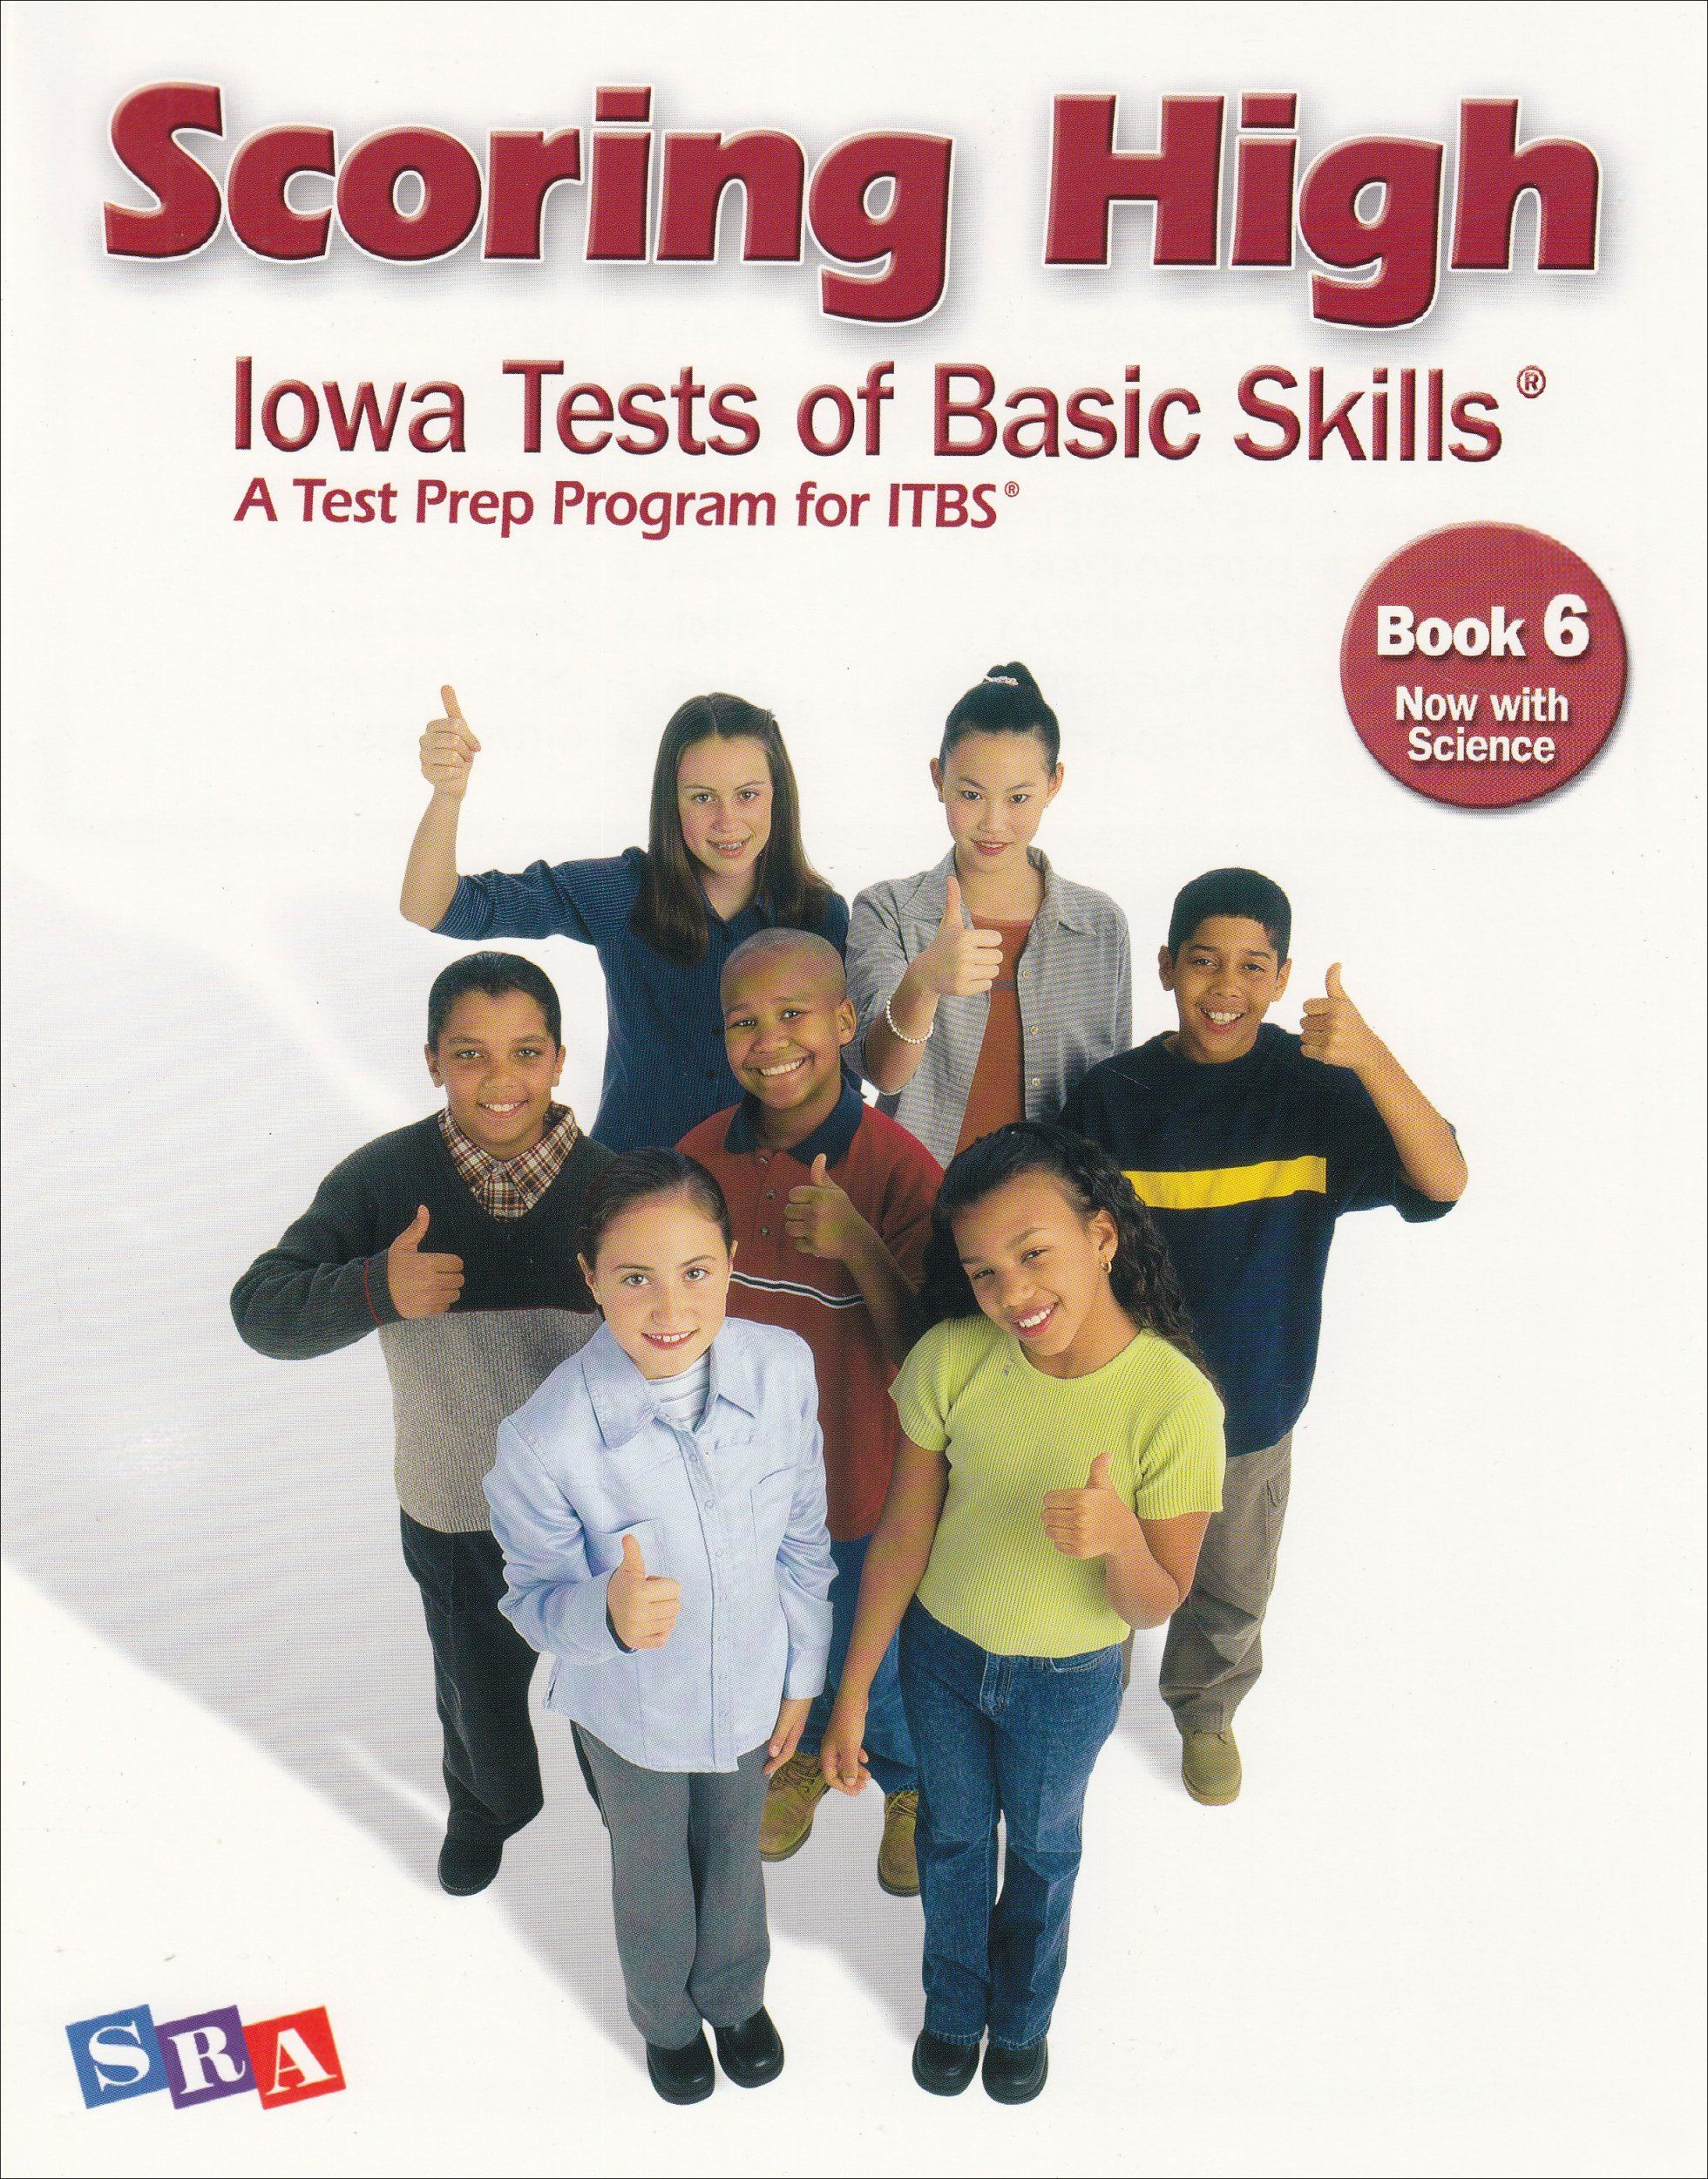 Scoring higher iowa tests of basic skills grade 6 aa scoring higher iowa tests of basic skills grade 6 aa 9780076043699 amazon books fandeluxe Image collections